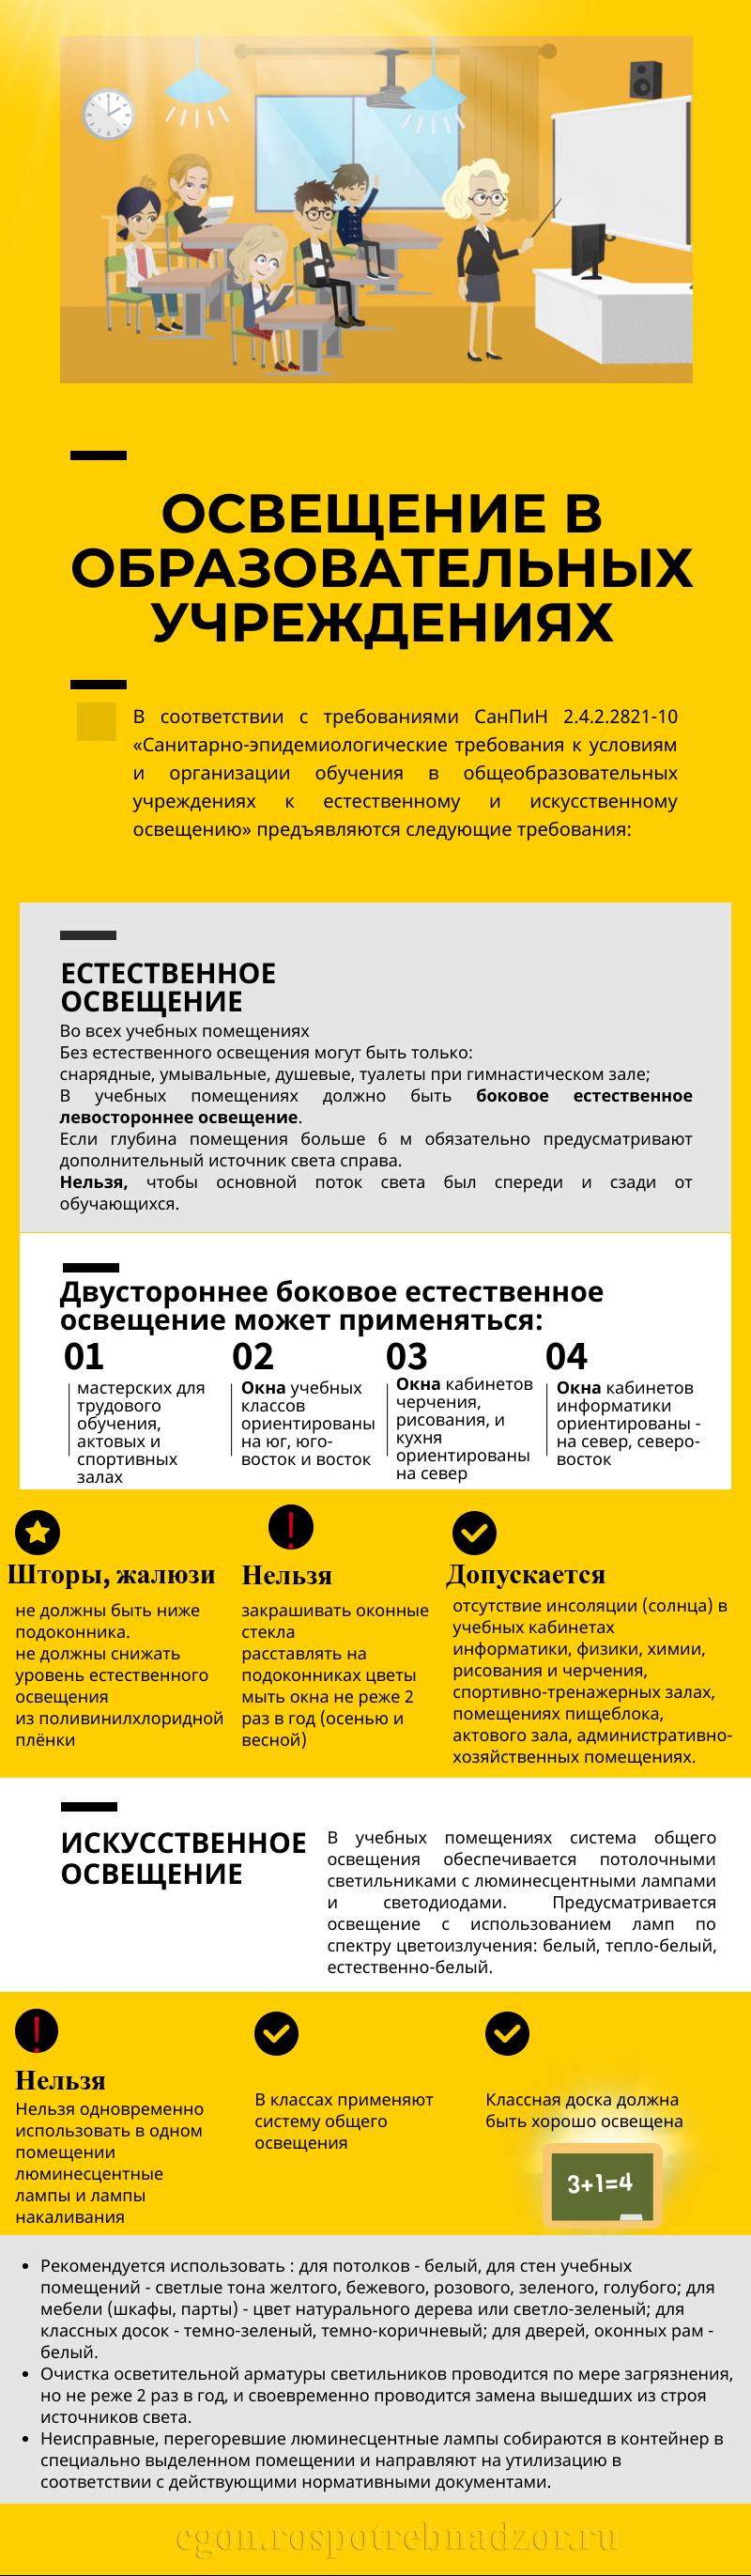 https://www.rospotrebnadzor.ru/files/news/untitled-5c-20i_41278968%20(2).png